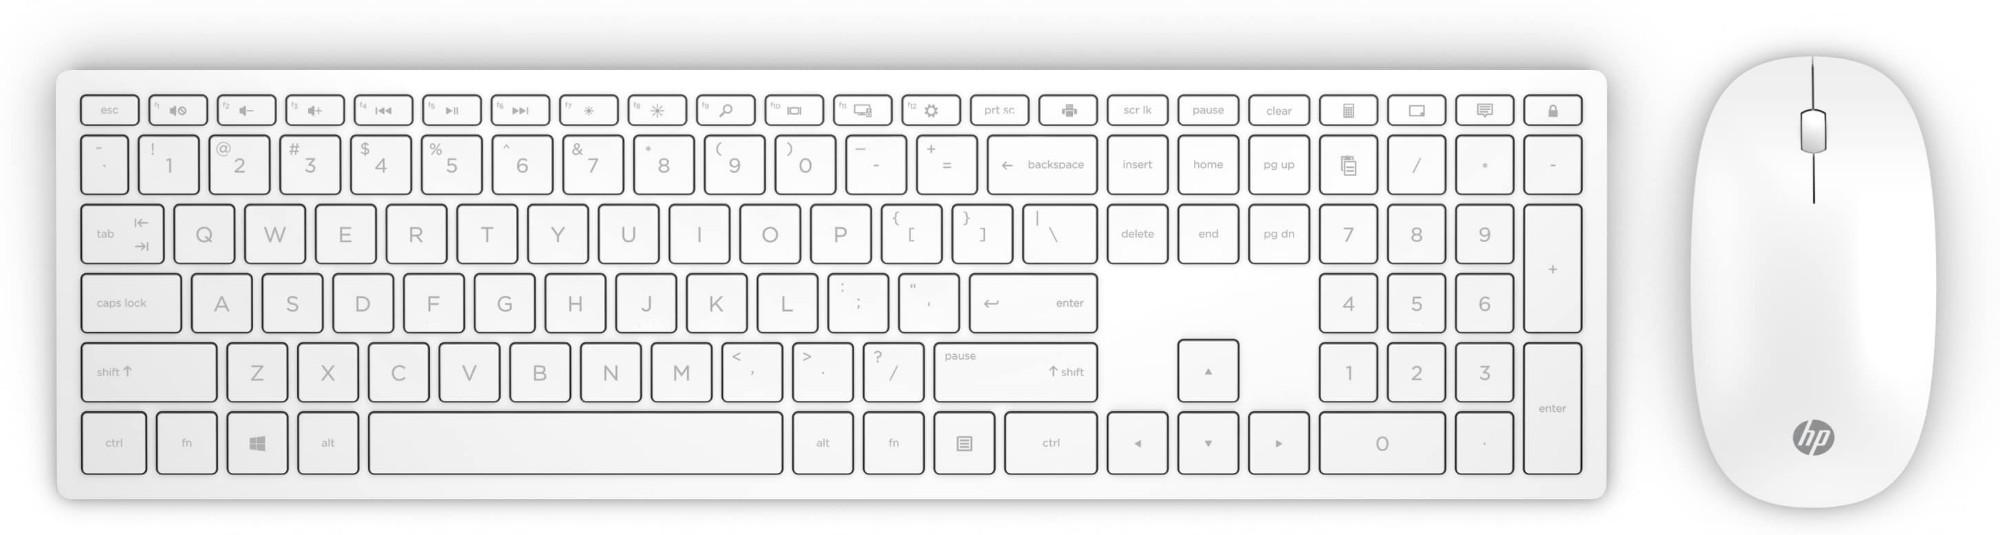 HP Pavilion 800 keyboard RF Wireless White - Keyboards